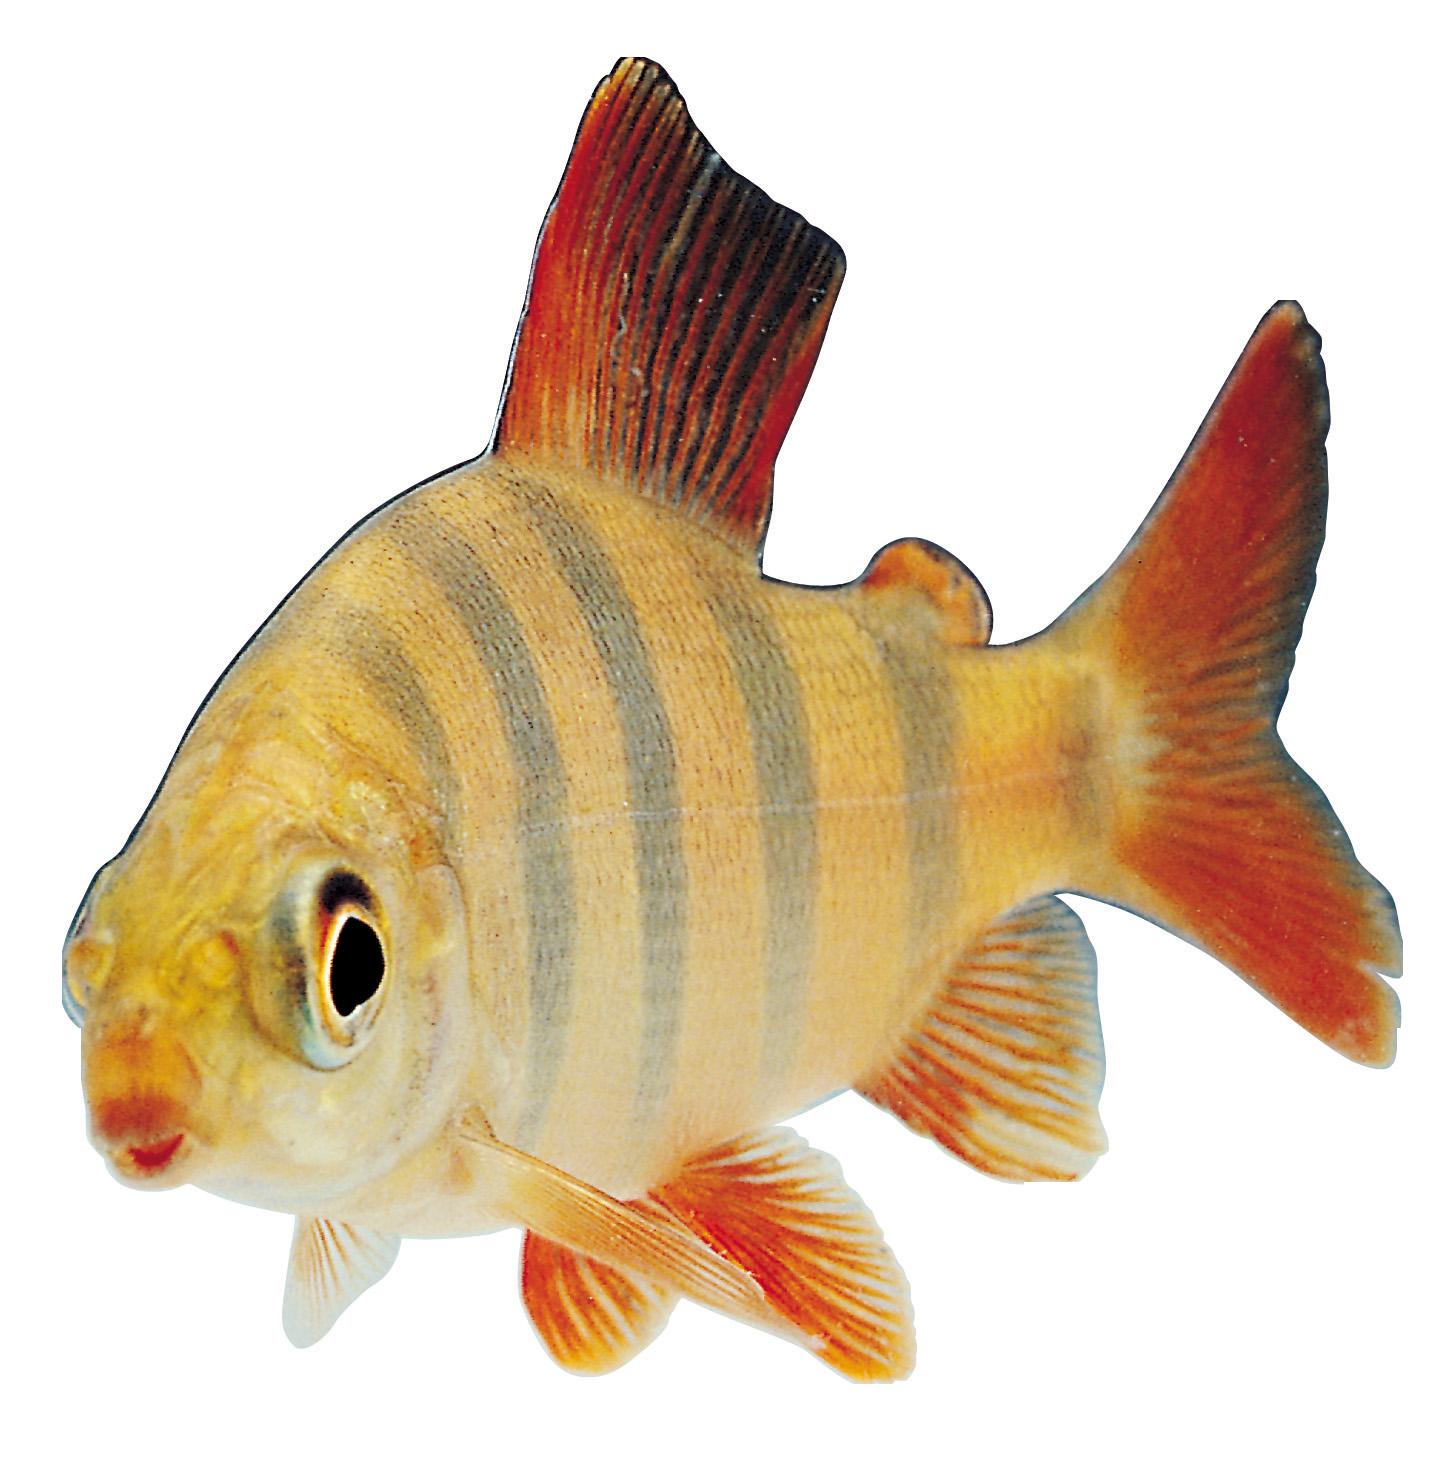 Fish feeder clipart picture download Fish Desktop Wallpaper Clip art - goldfish 1440*1458 transprent Png ... picture download